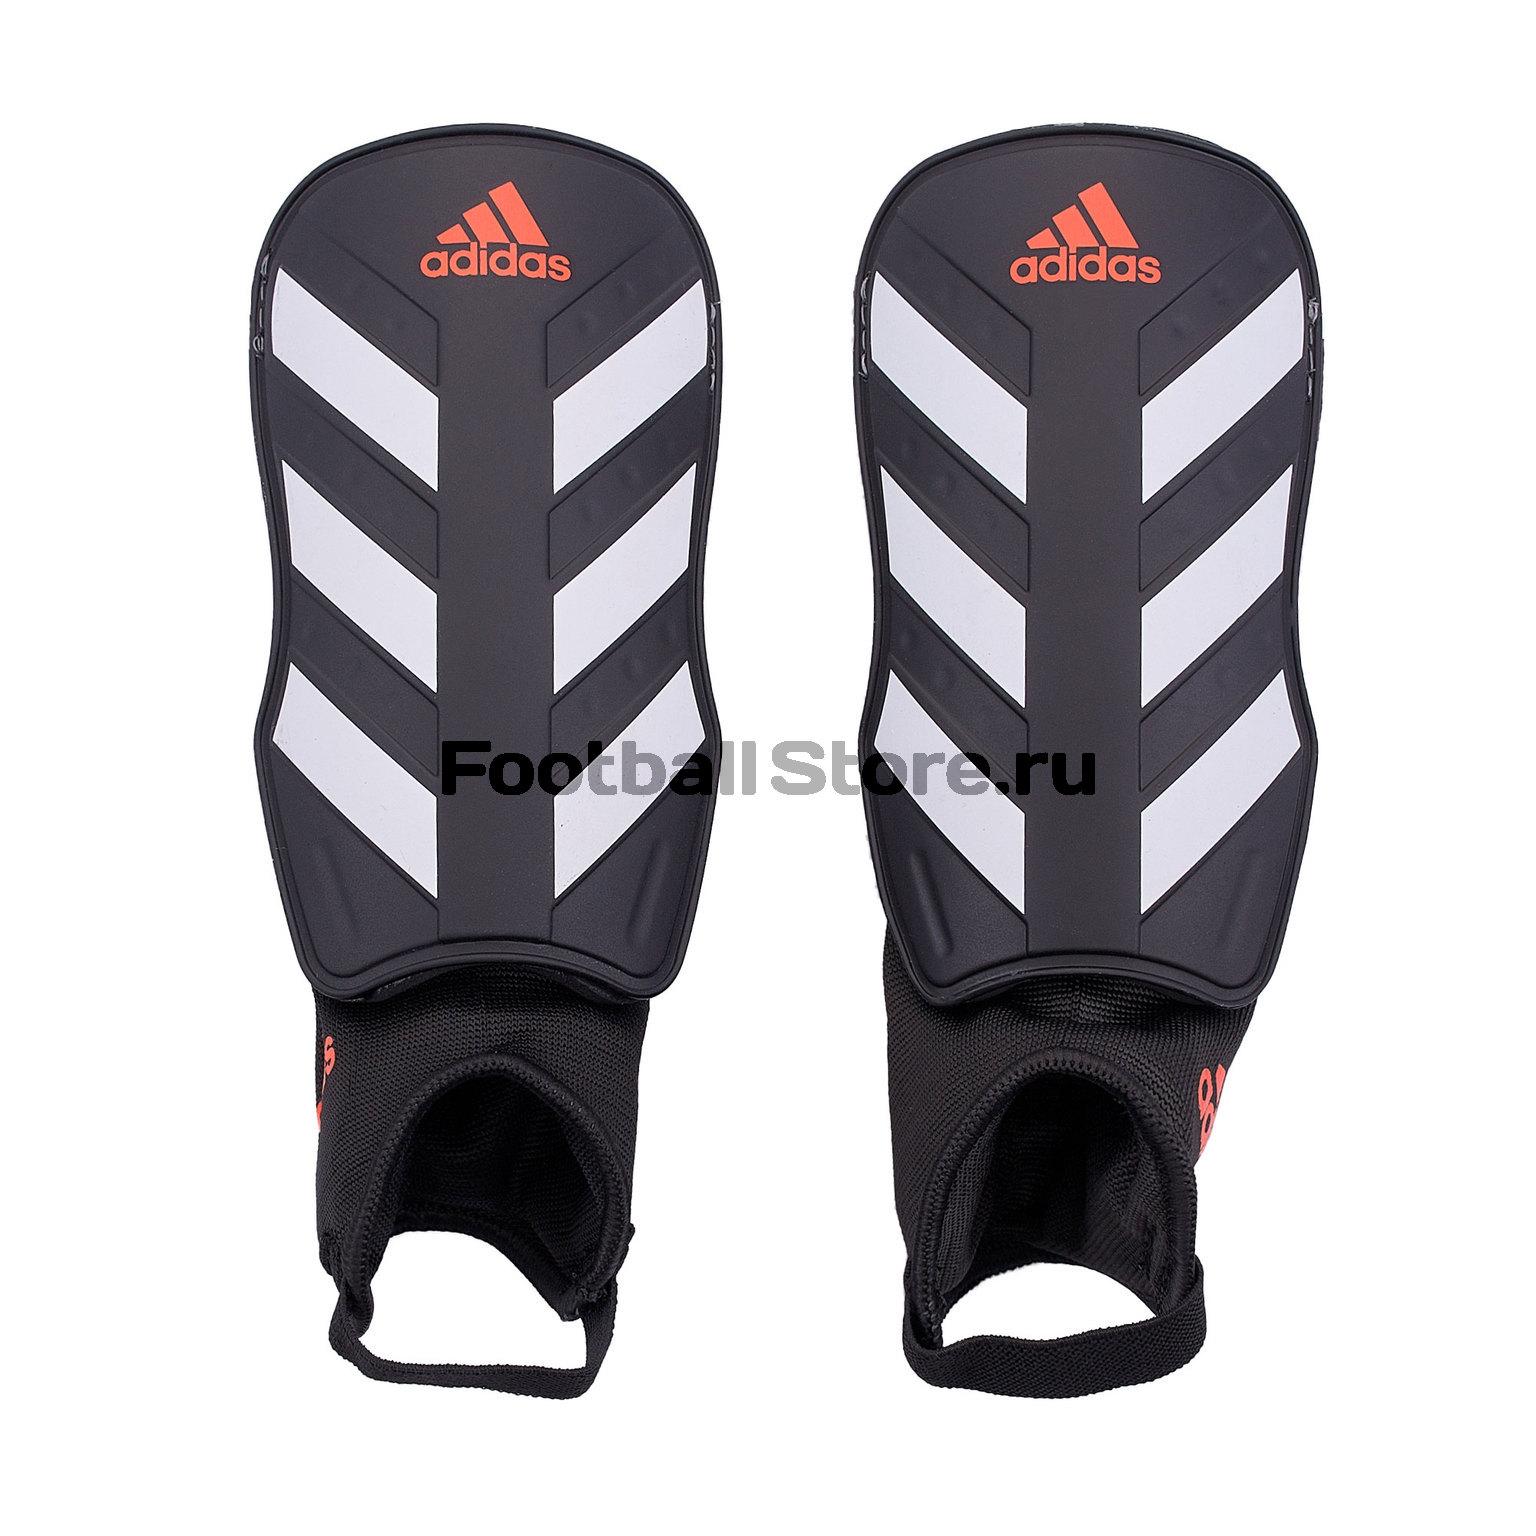 Щитки Adidas Everclub CW5564